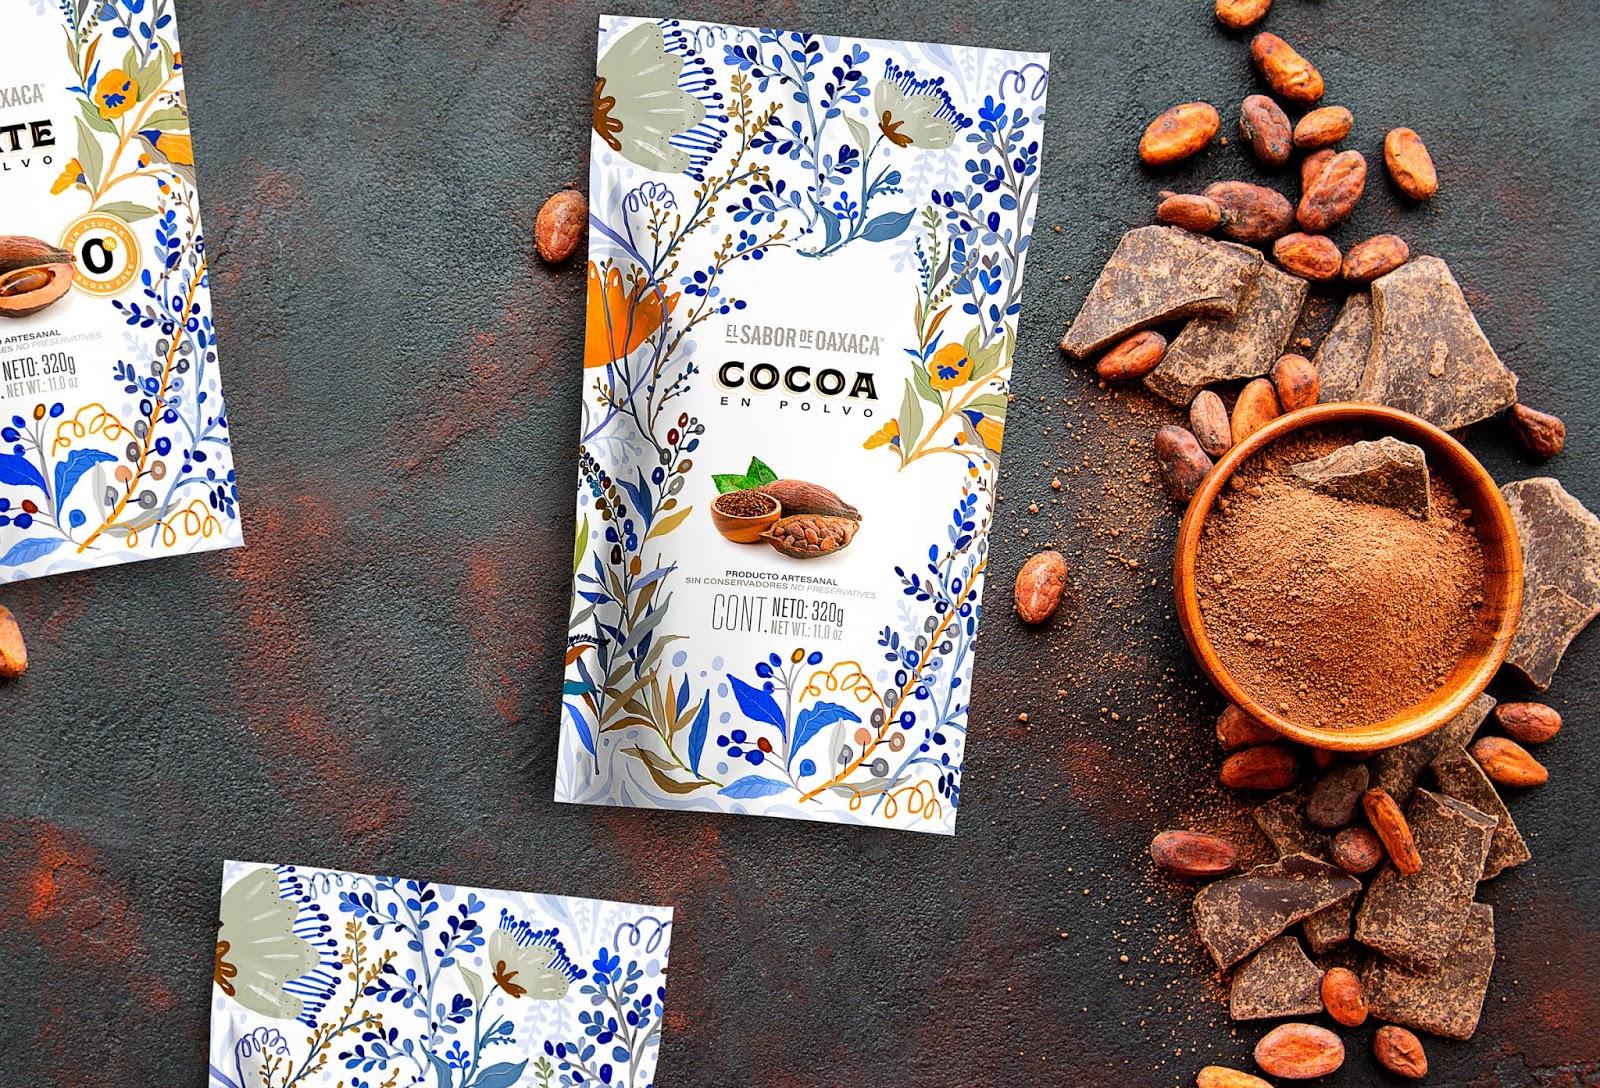 Sabor de Oaxaca (cacao) I Design : Nacho Huizar, Guadalajara, Mexique (juillet 2019)